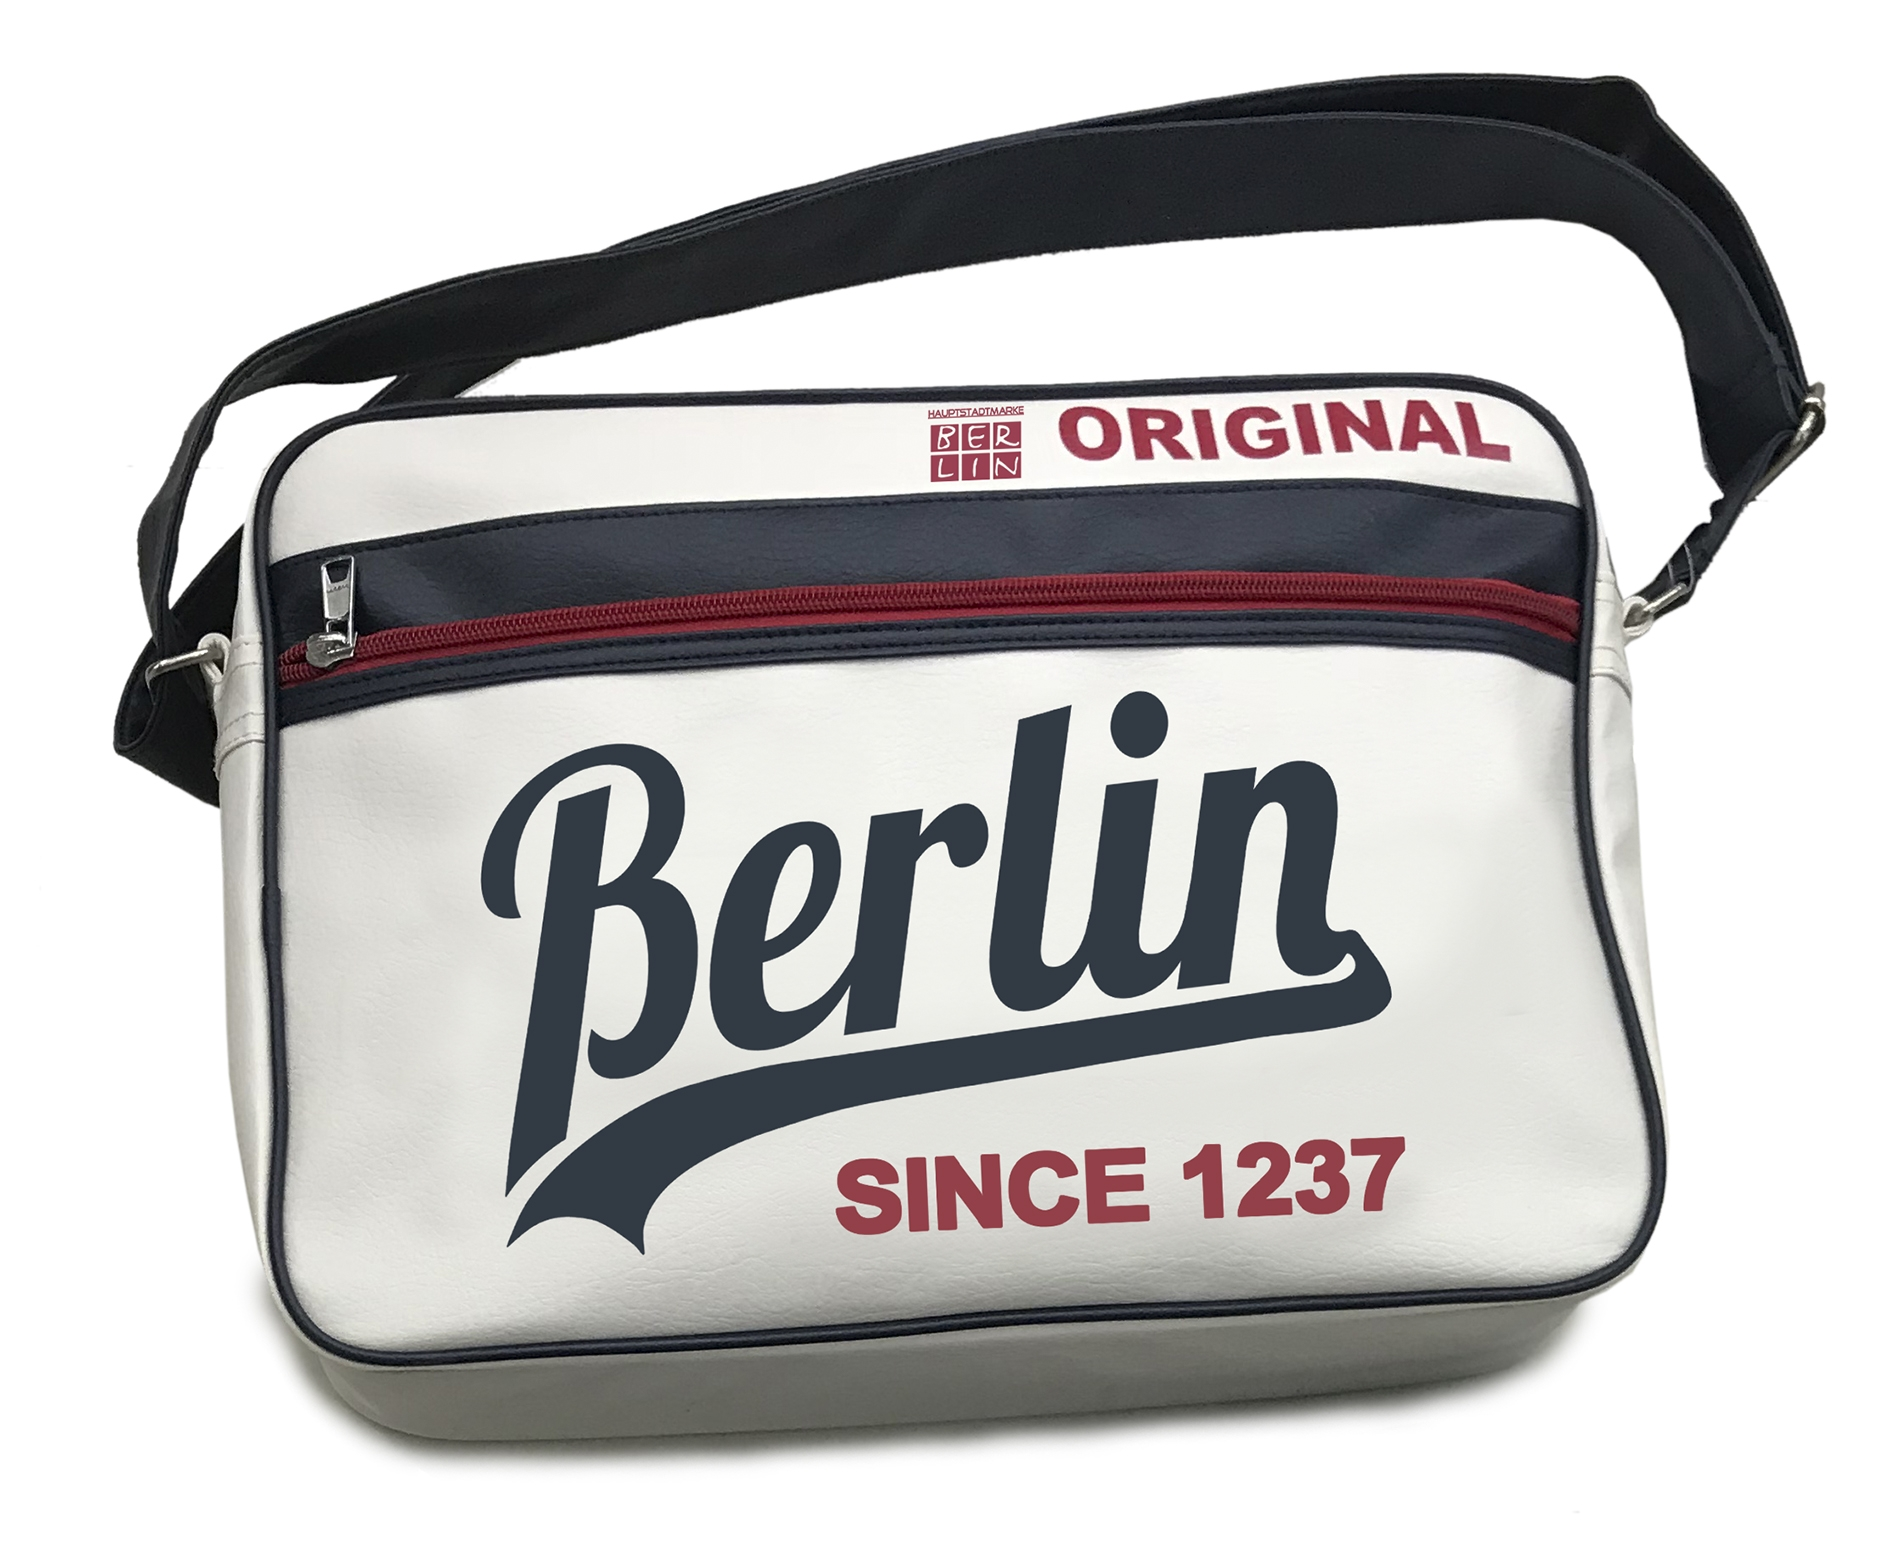 Retrotasche BERLIN Original weiß